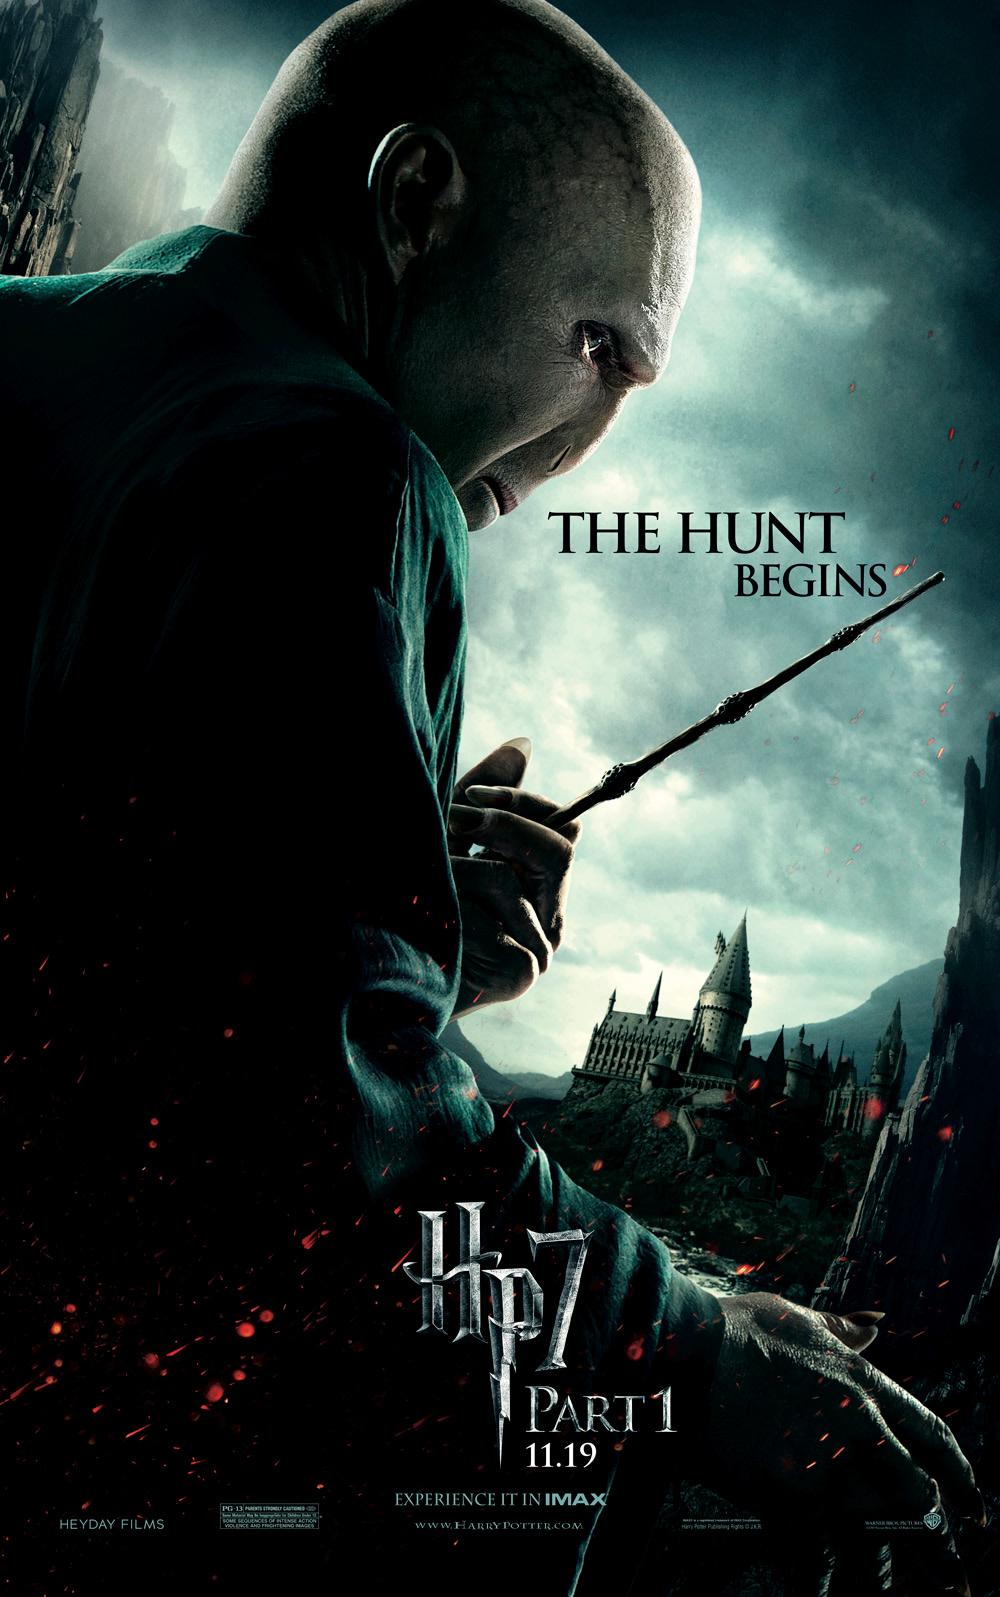 'Deathly Hallows: Part 1' Voldemort poster